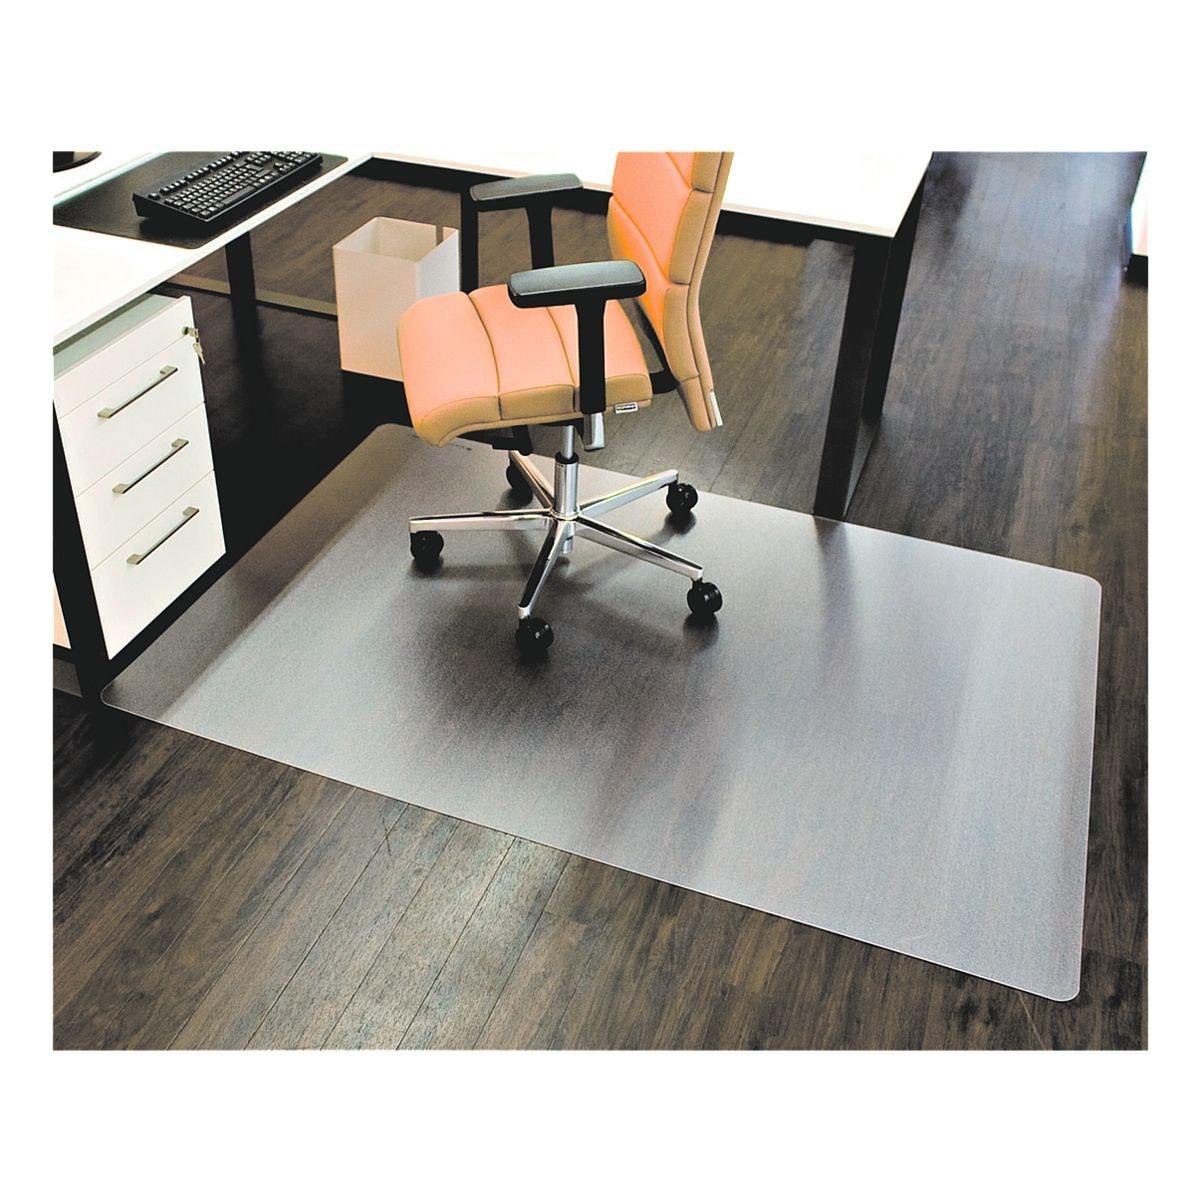 bodenschutzmatte f r hartb den makrolon rechteck 120 x 180 cm rs office products roll o grip. Black Bedroom Furniture Sets. Home Design Ideas